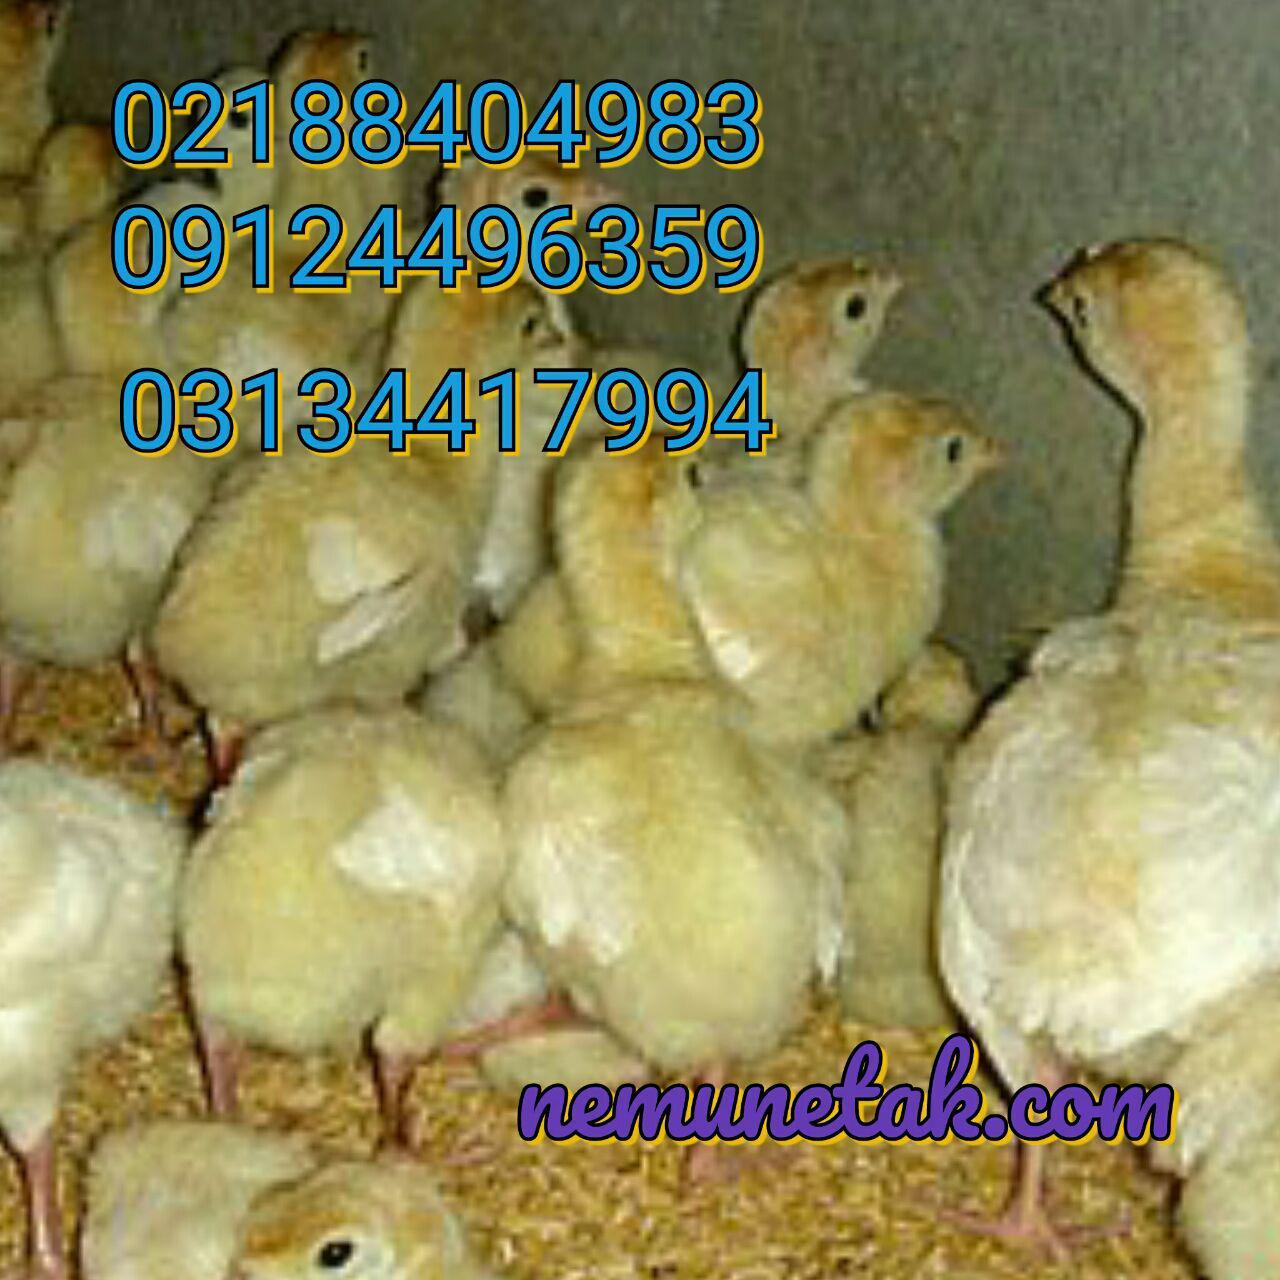 فروش بوقلمون بیوتی 09124496359